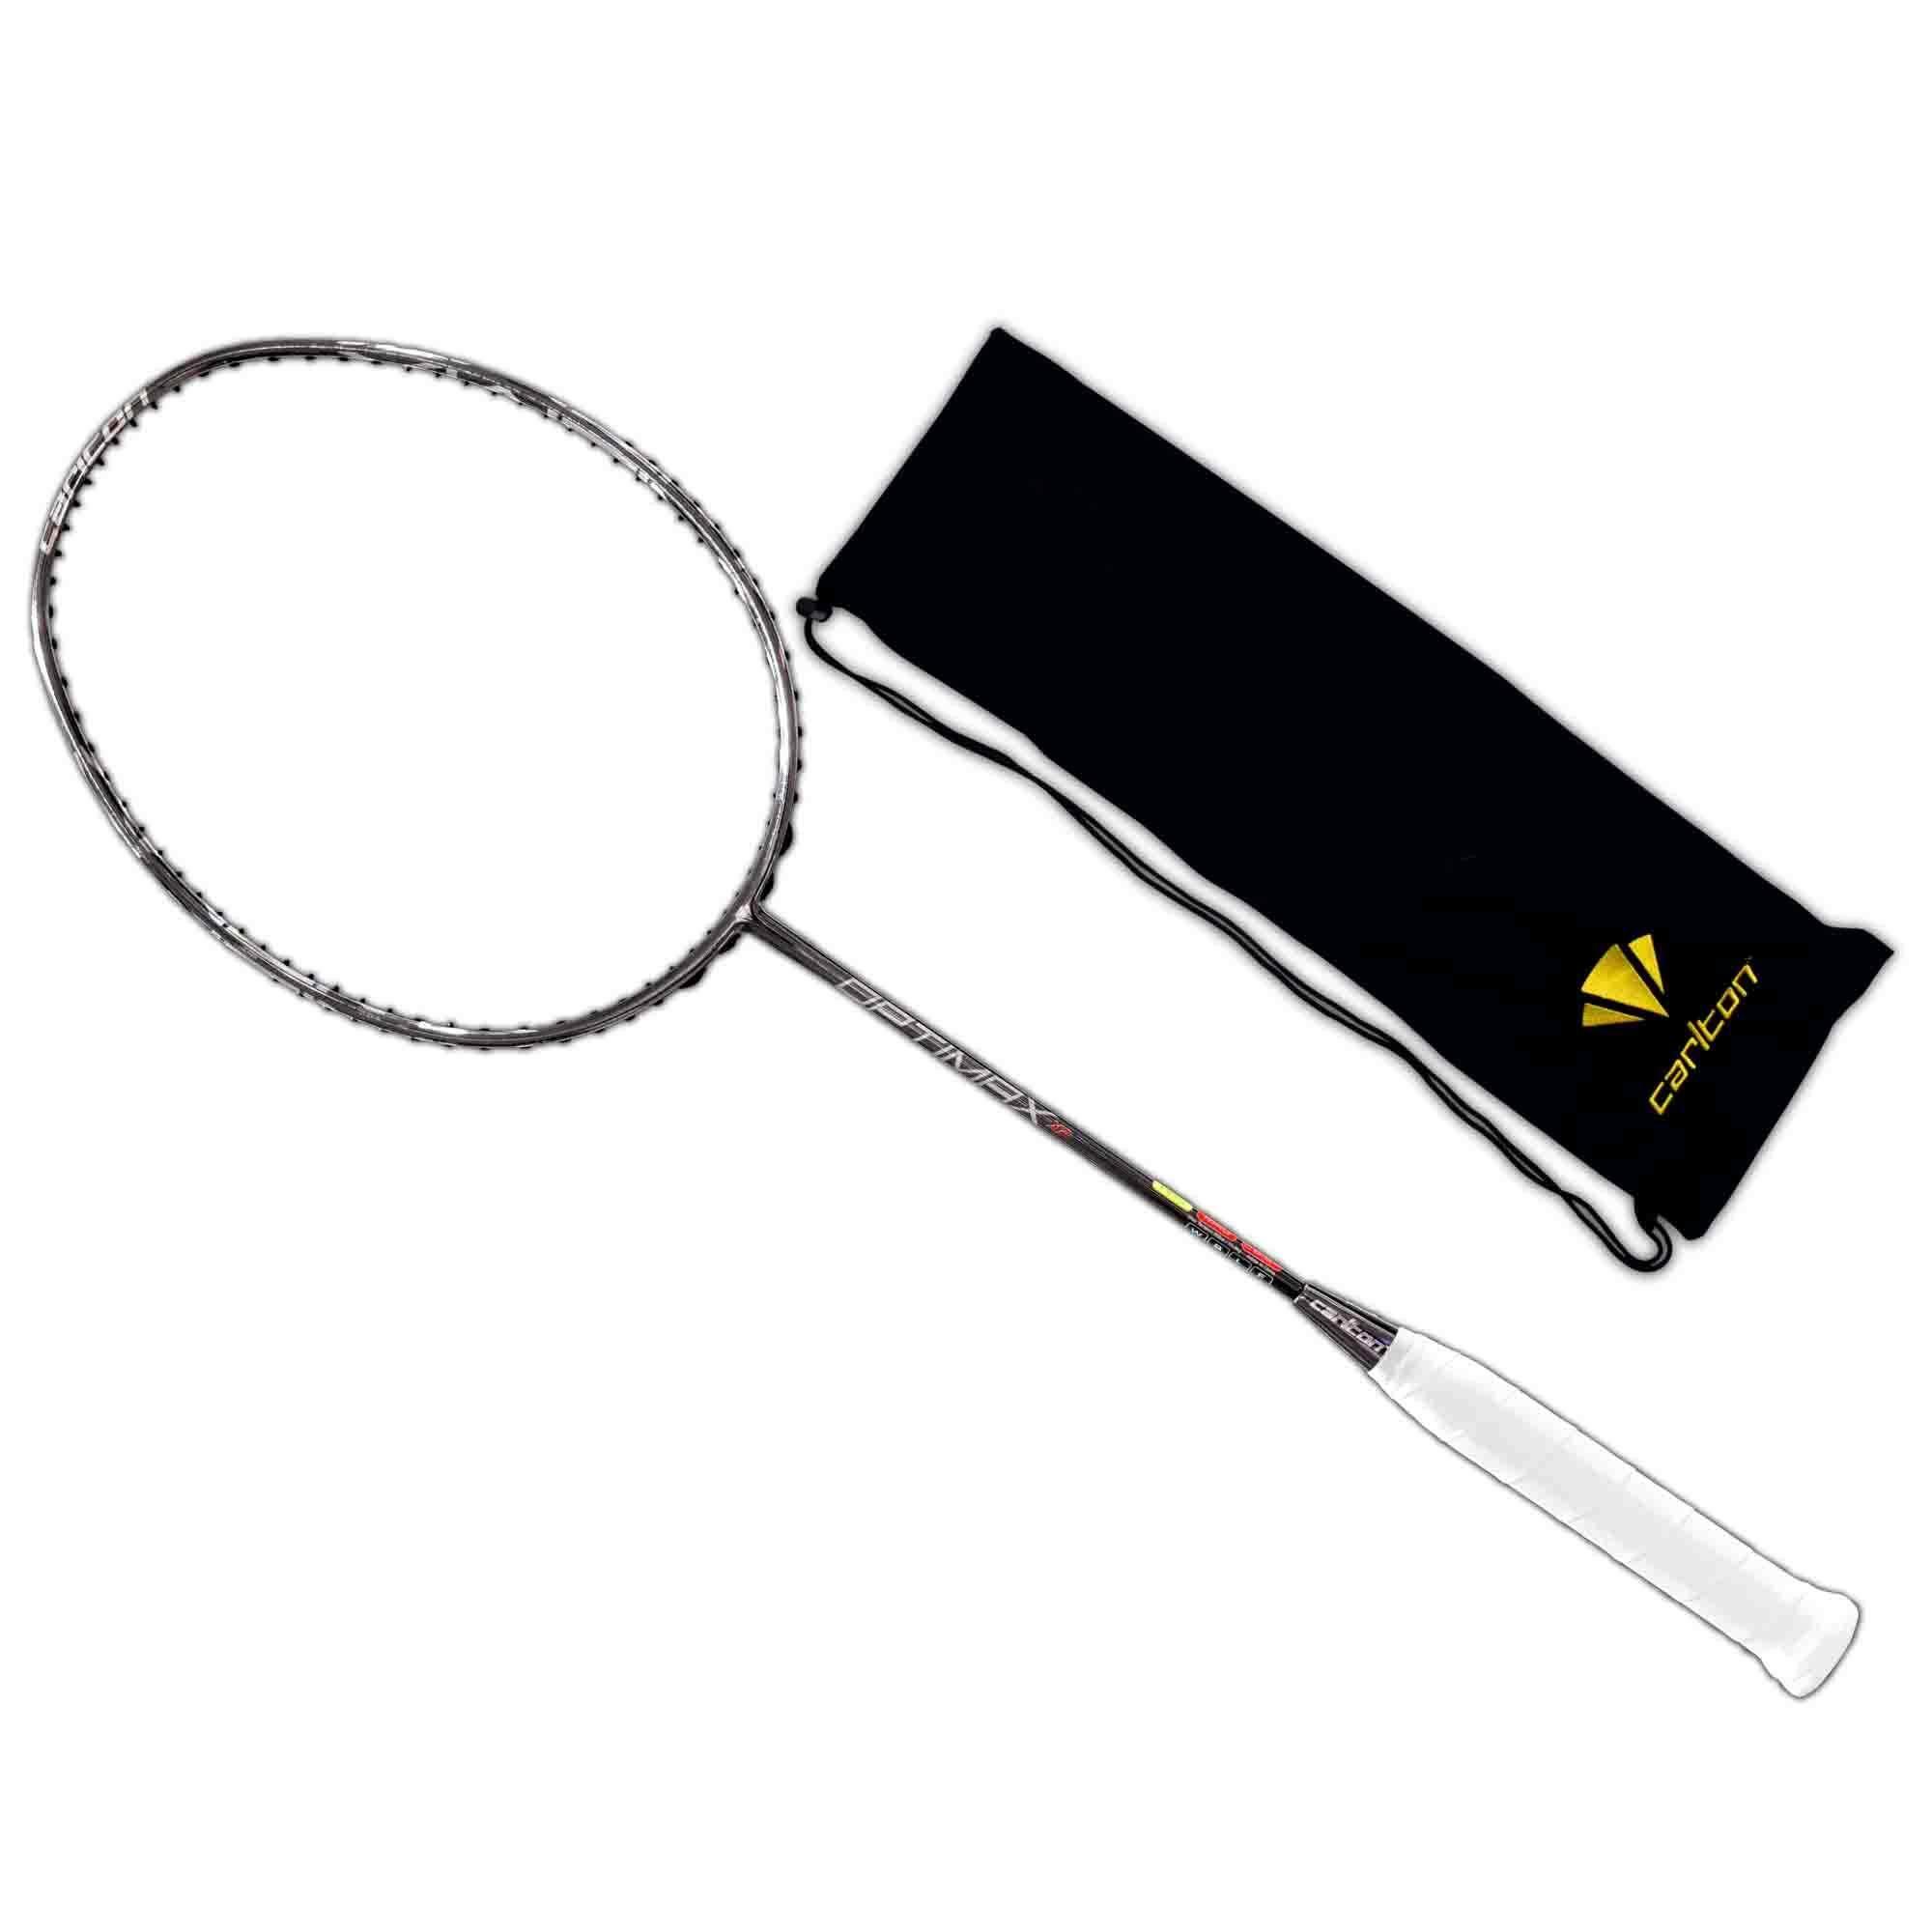 Carlton Badminton Racket Optimax XP